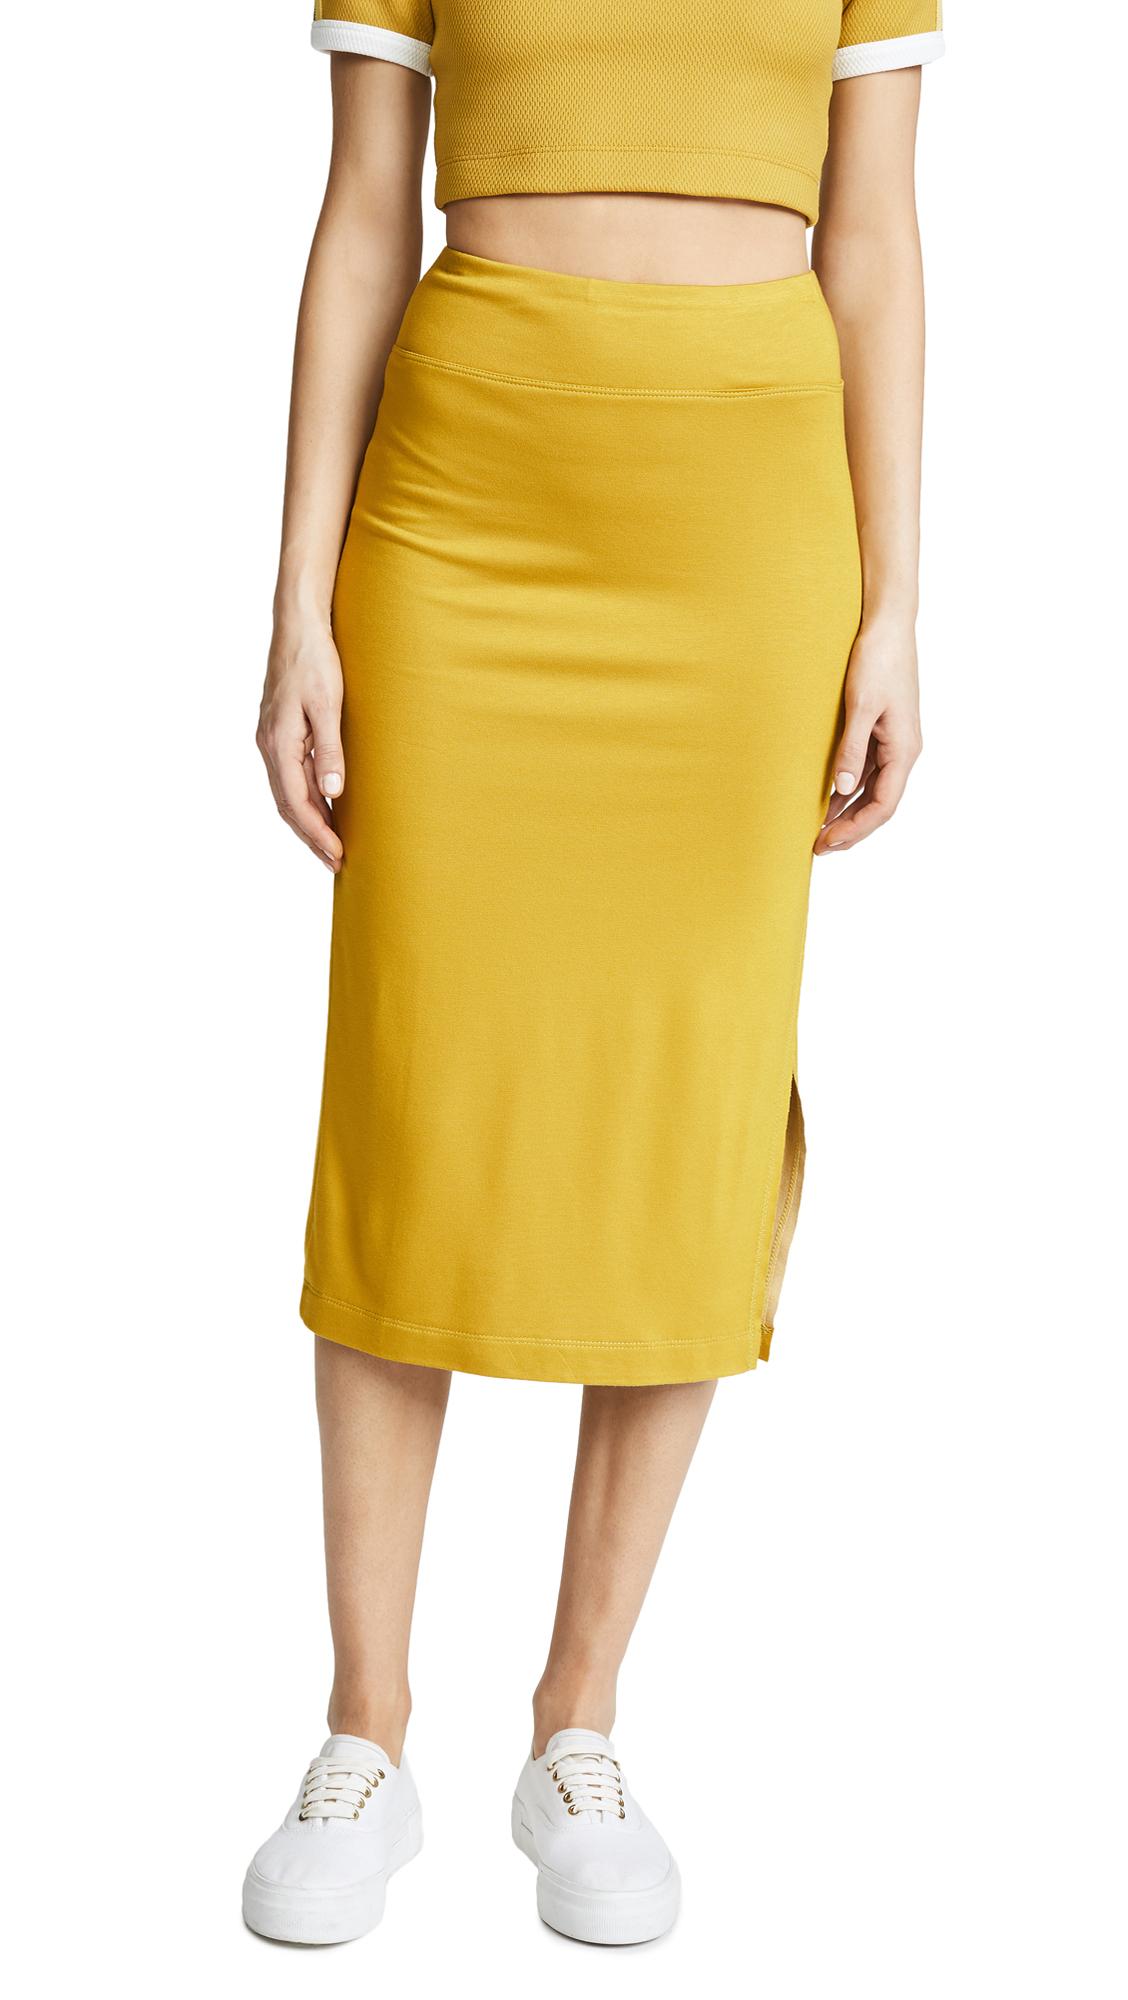 Drummond Plated Pencil Skirt, Mustard/White